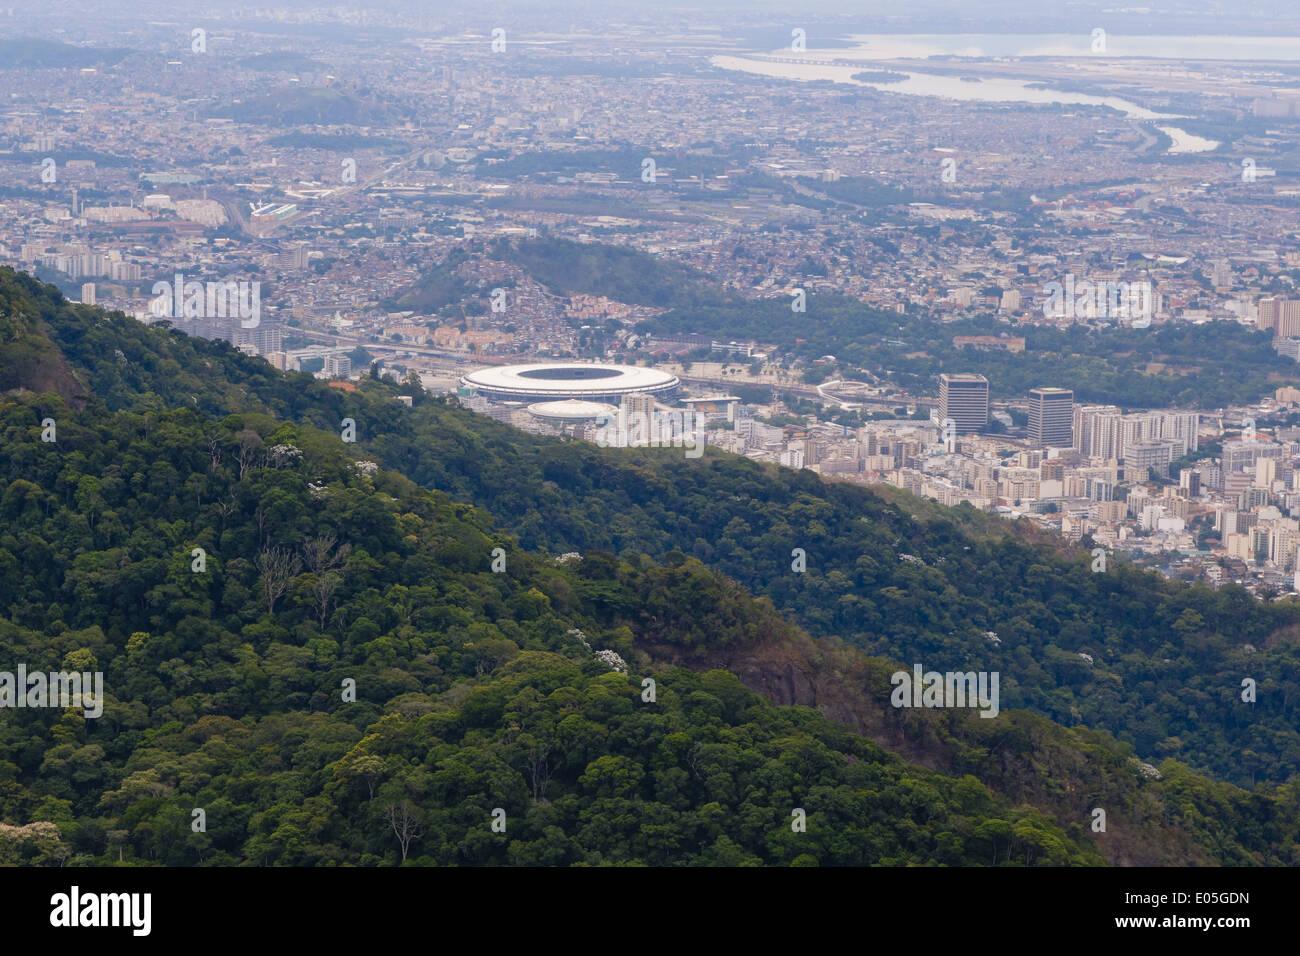 Rio de Janeiro, Zona Norte, Stadion, la FIFA 2014 Maracana, Worldcup, Brésil Photo Stock